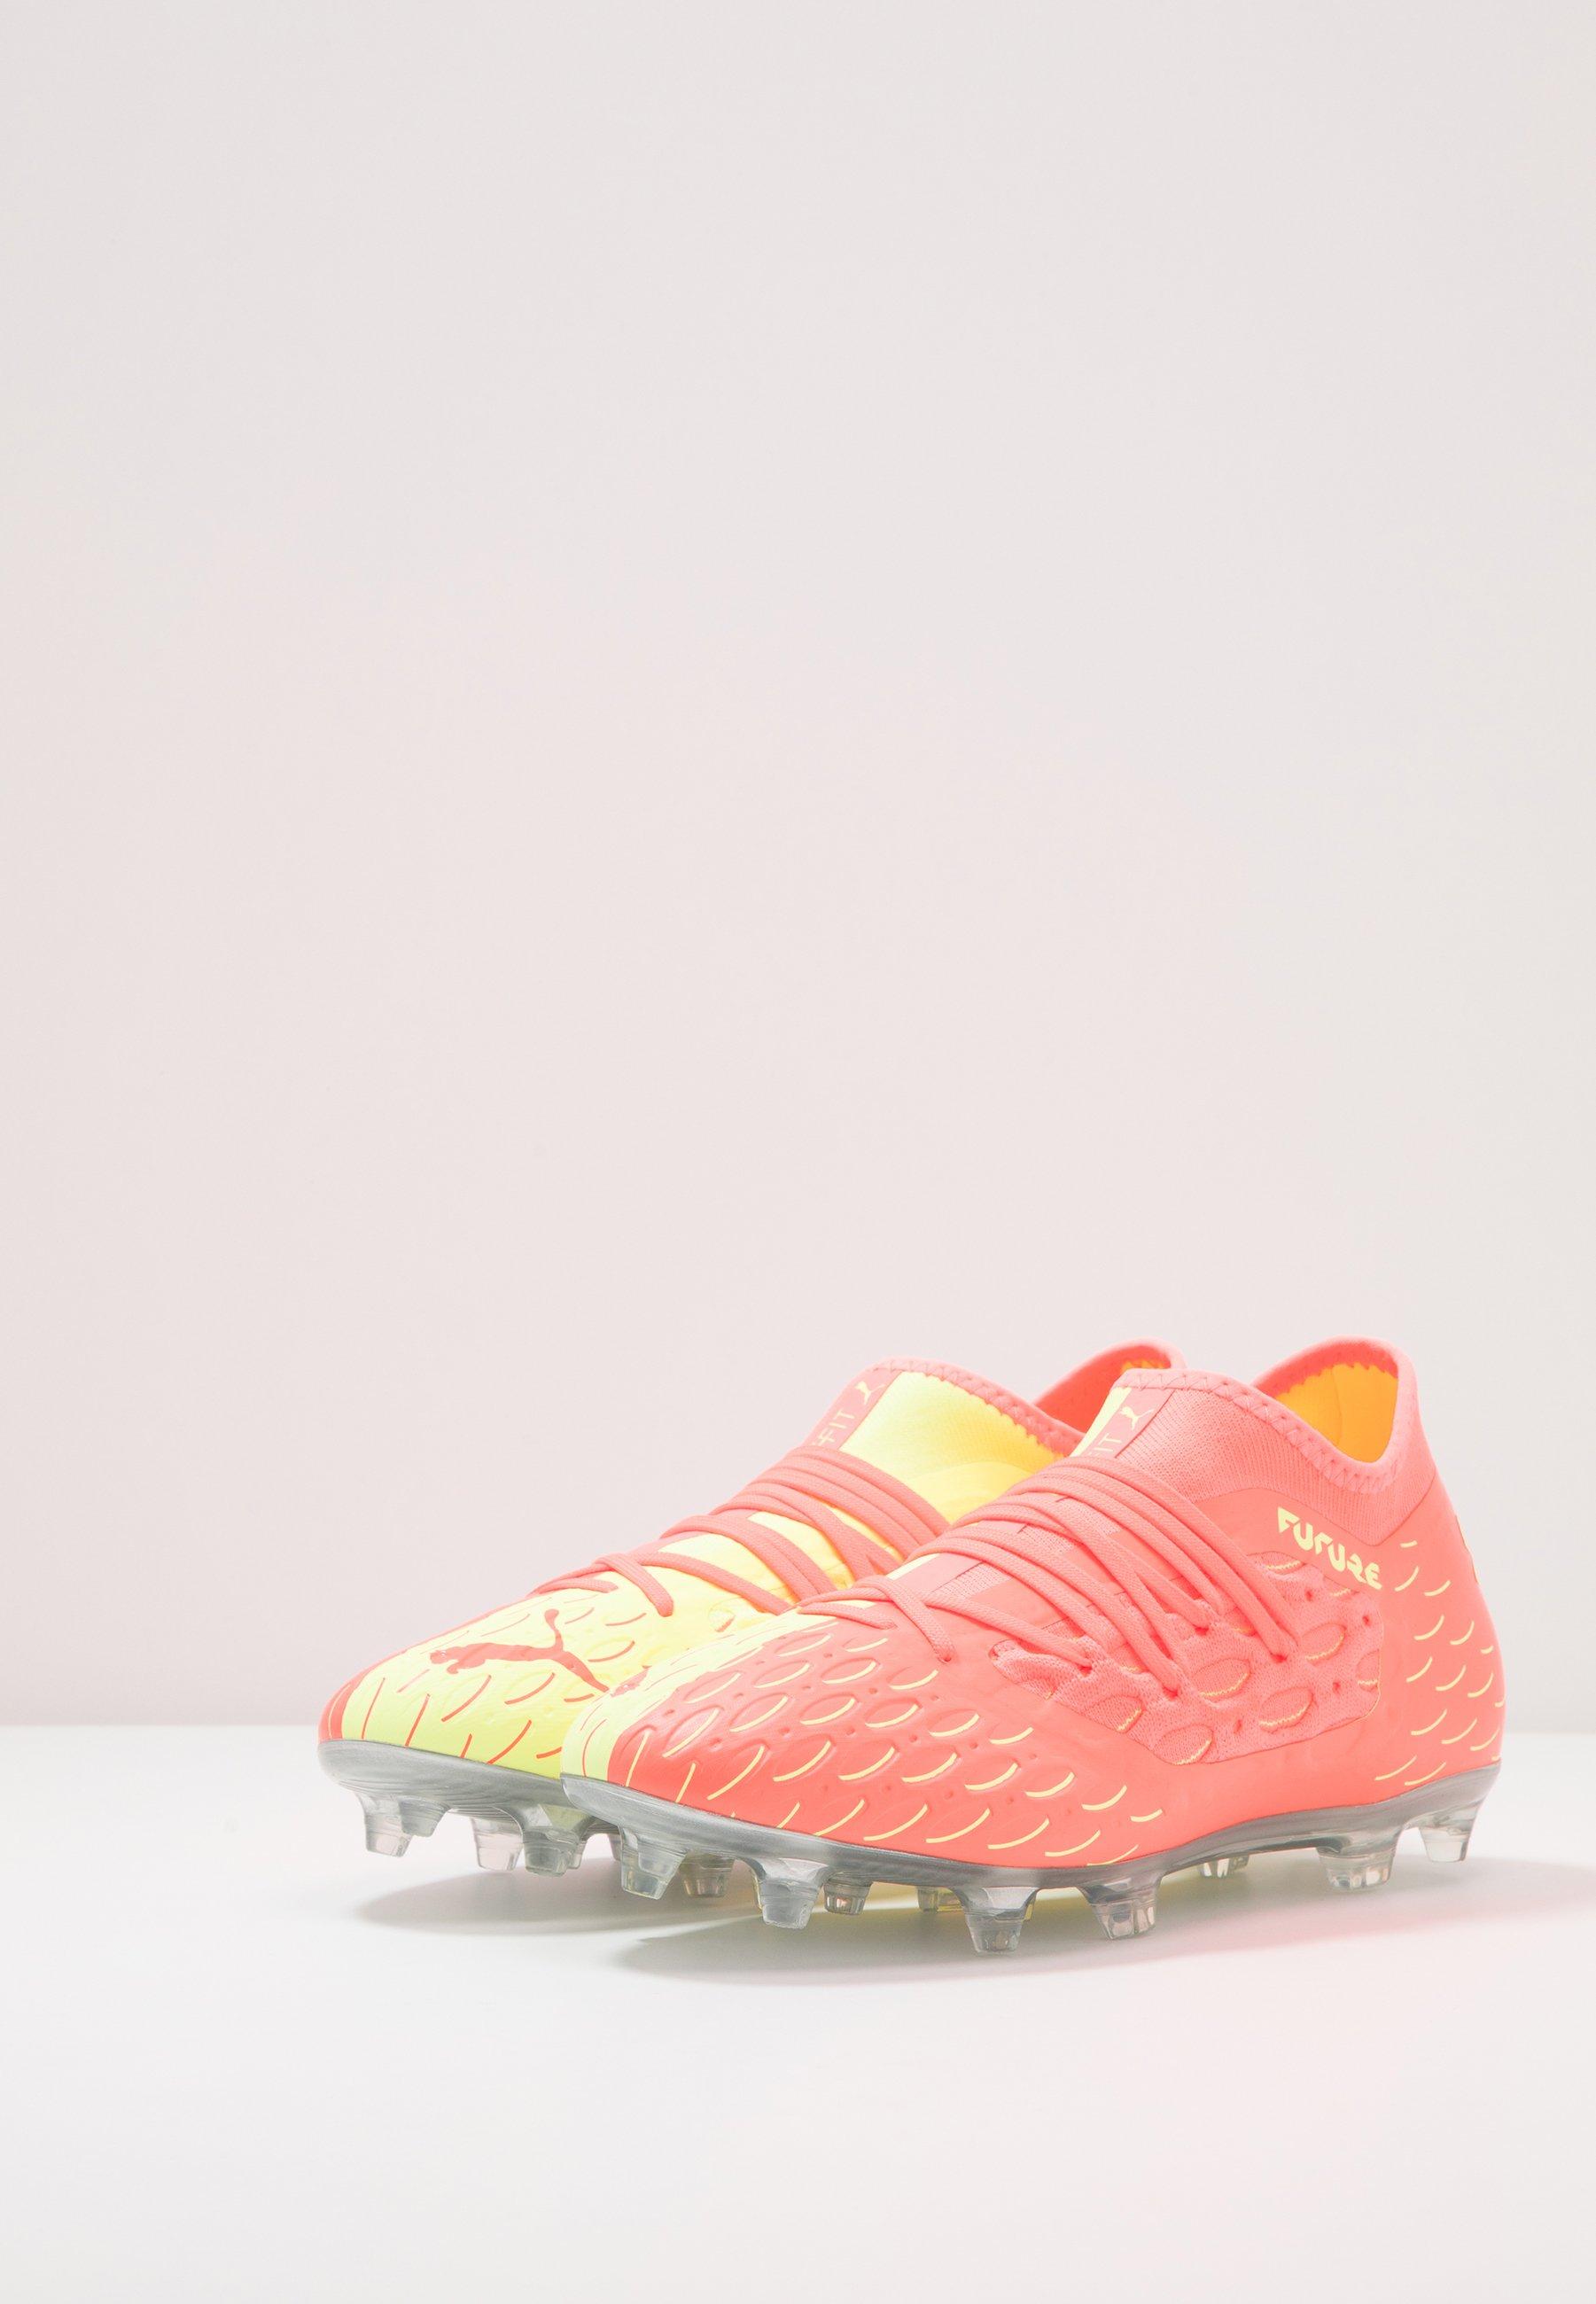 FUTURE 5.3 NETFIT OSG FGAG Fotbollsskor fasta dobbar energy peachfizzy yellow